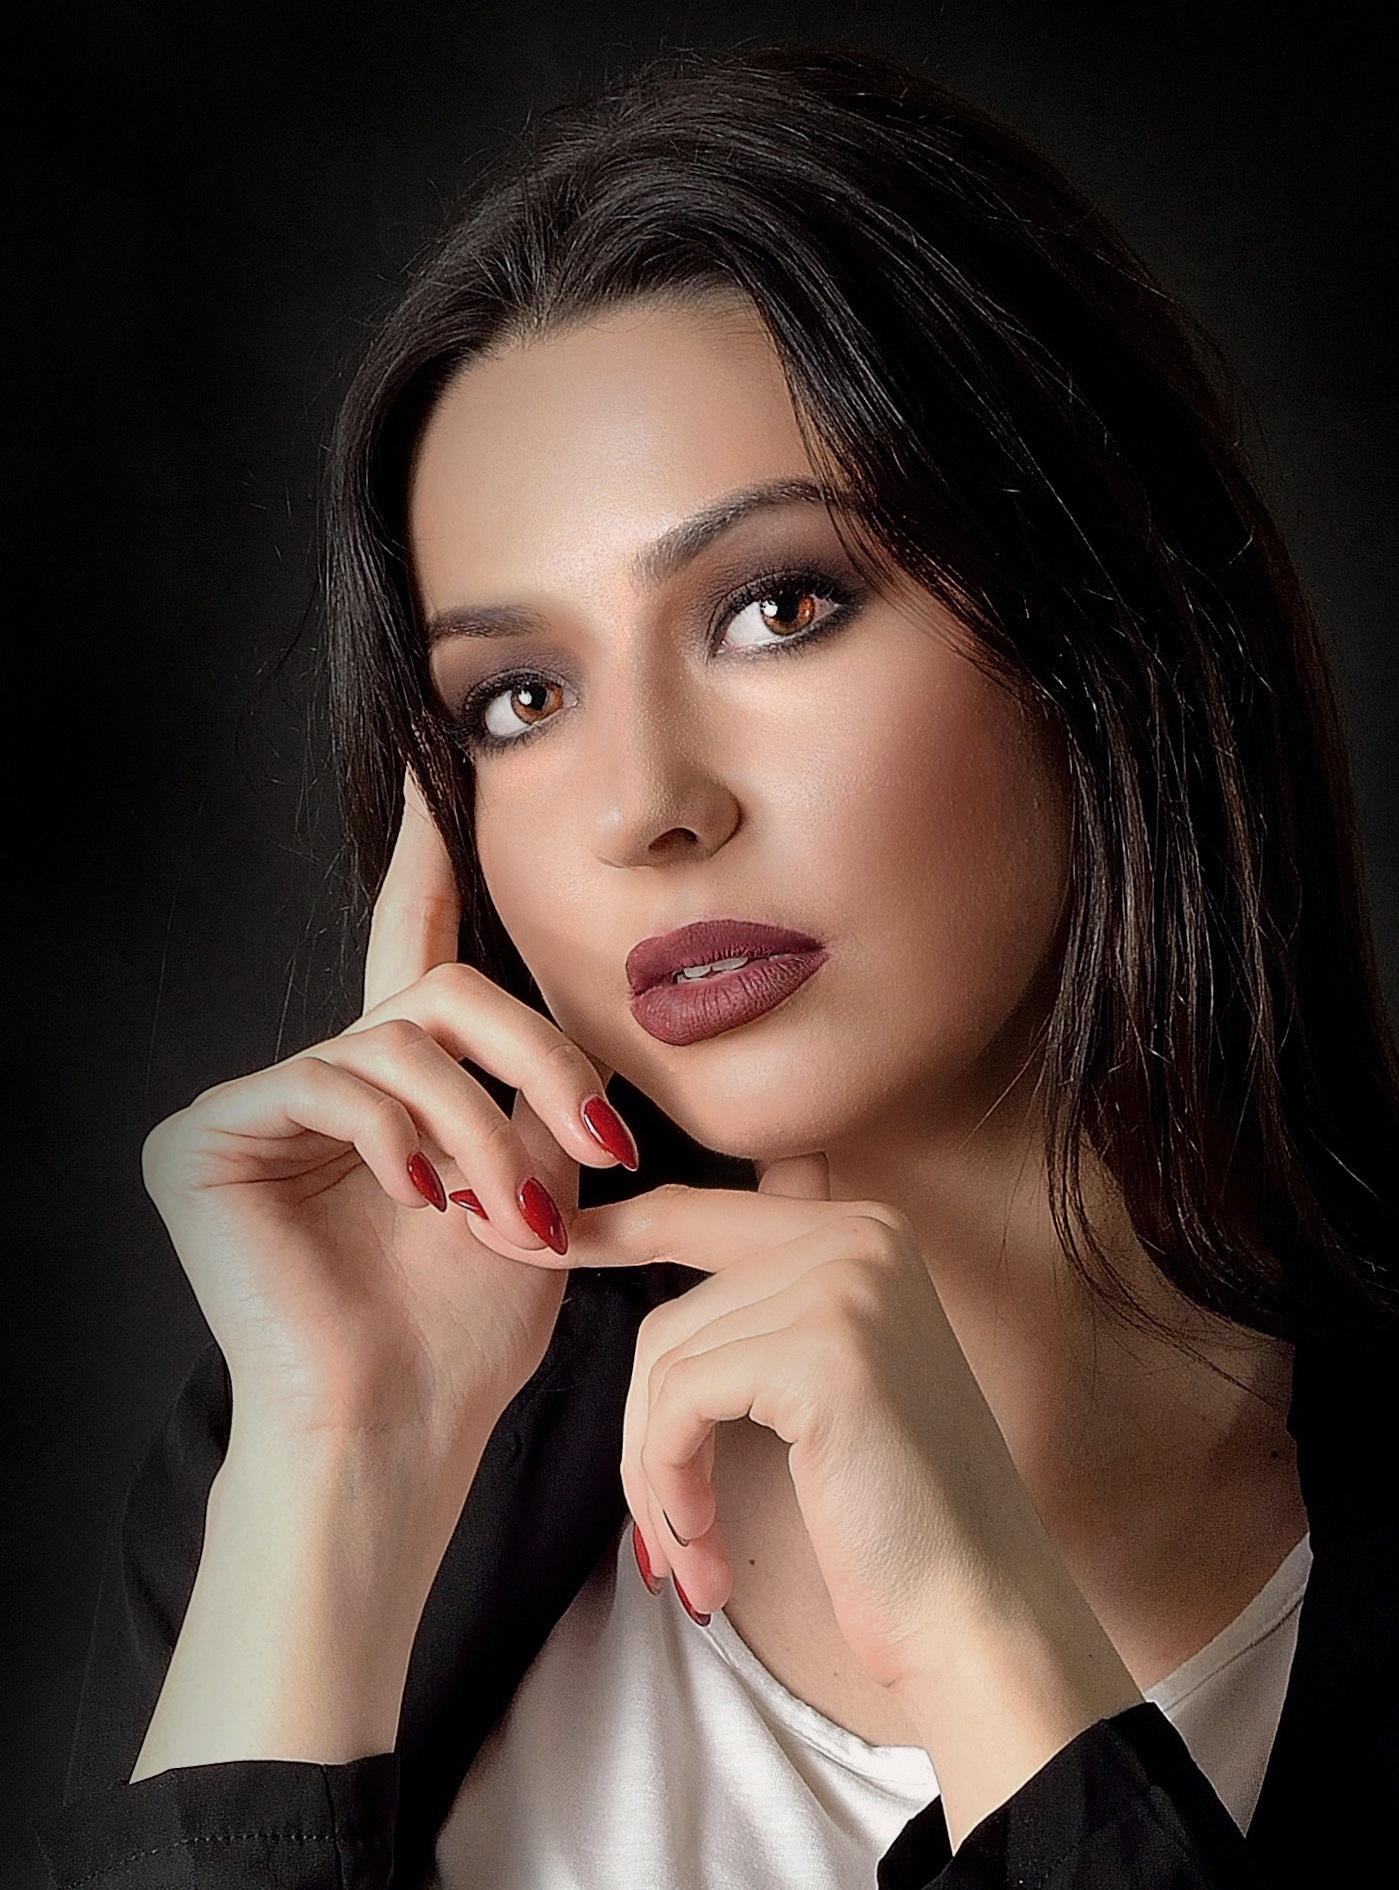 Amila by Soha Sanela Puskar